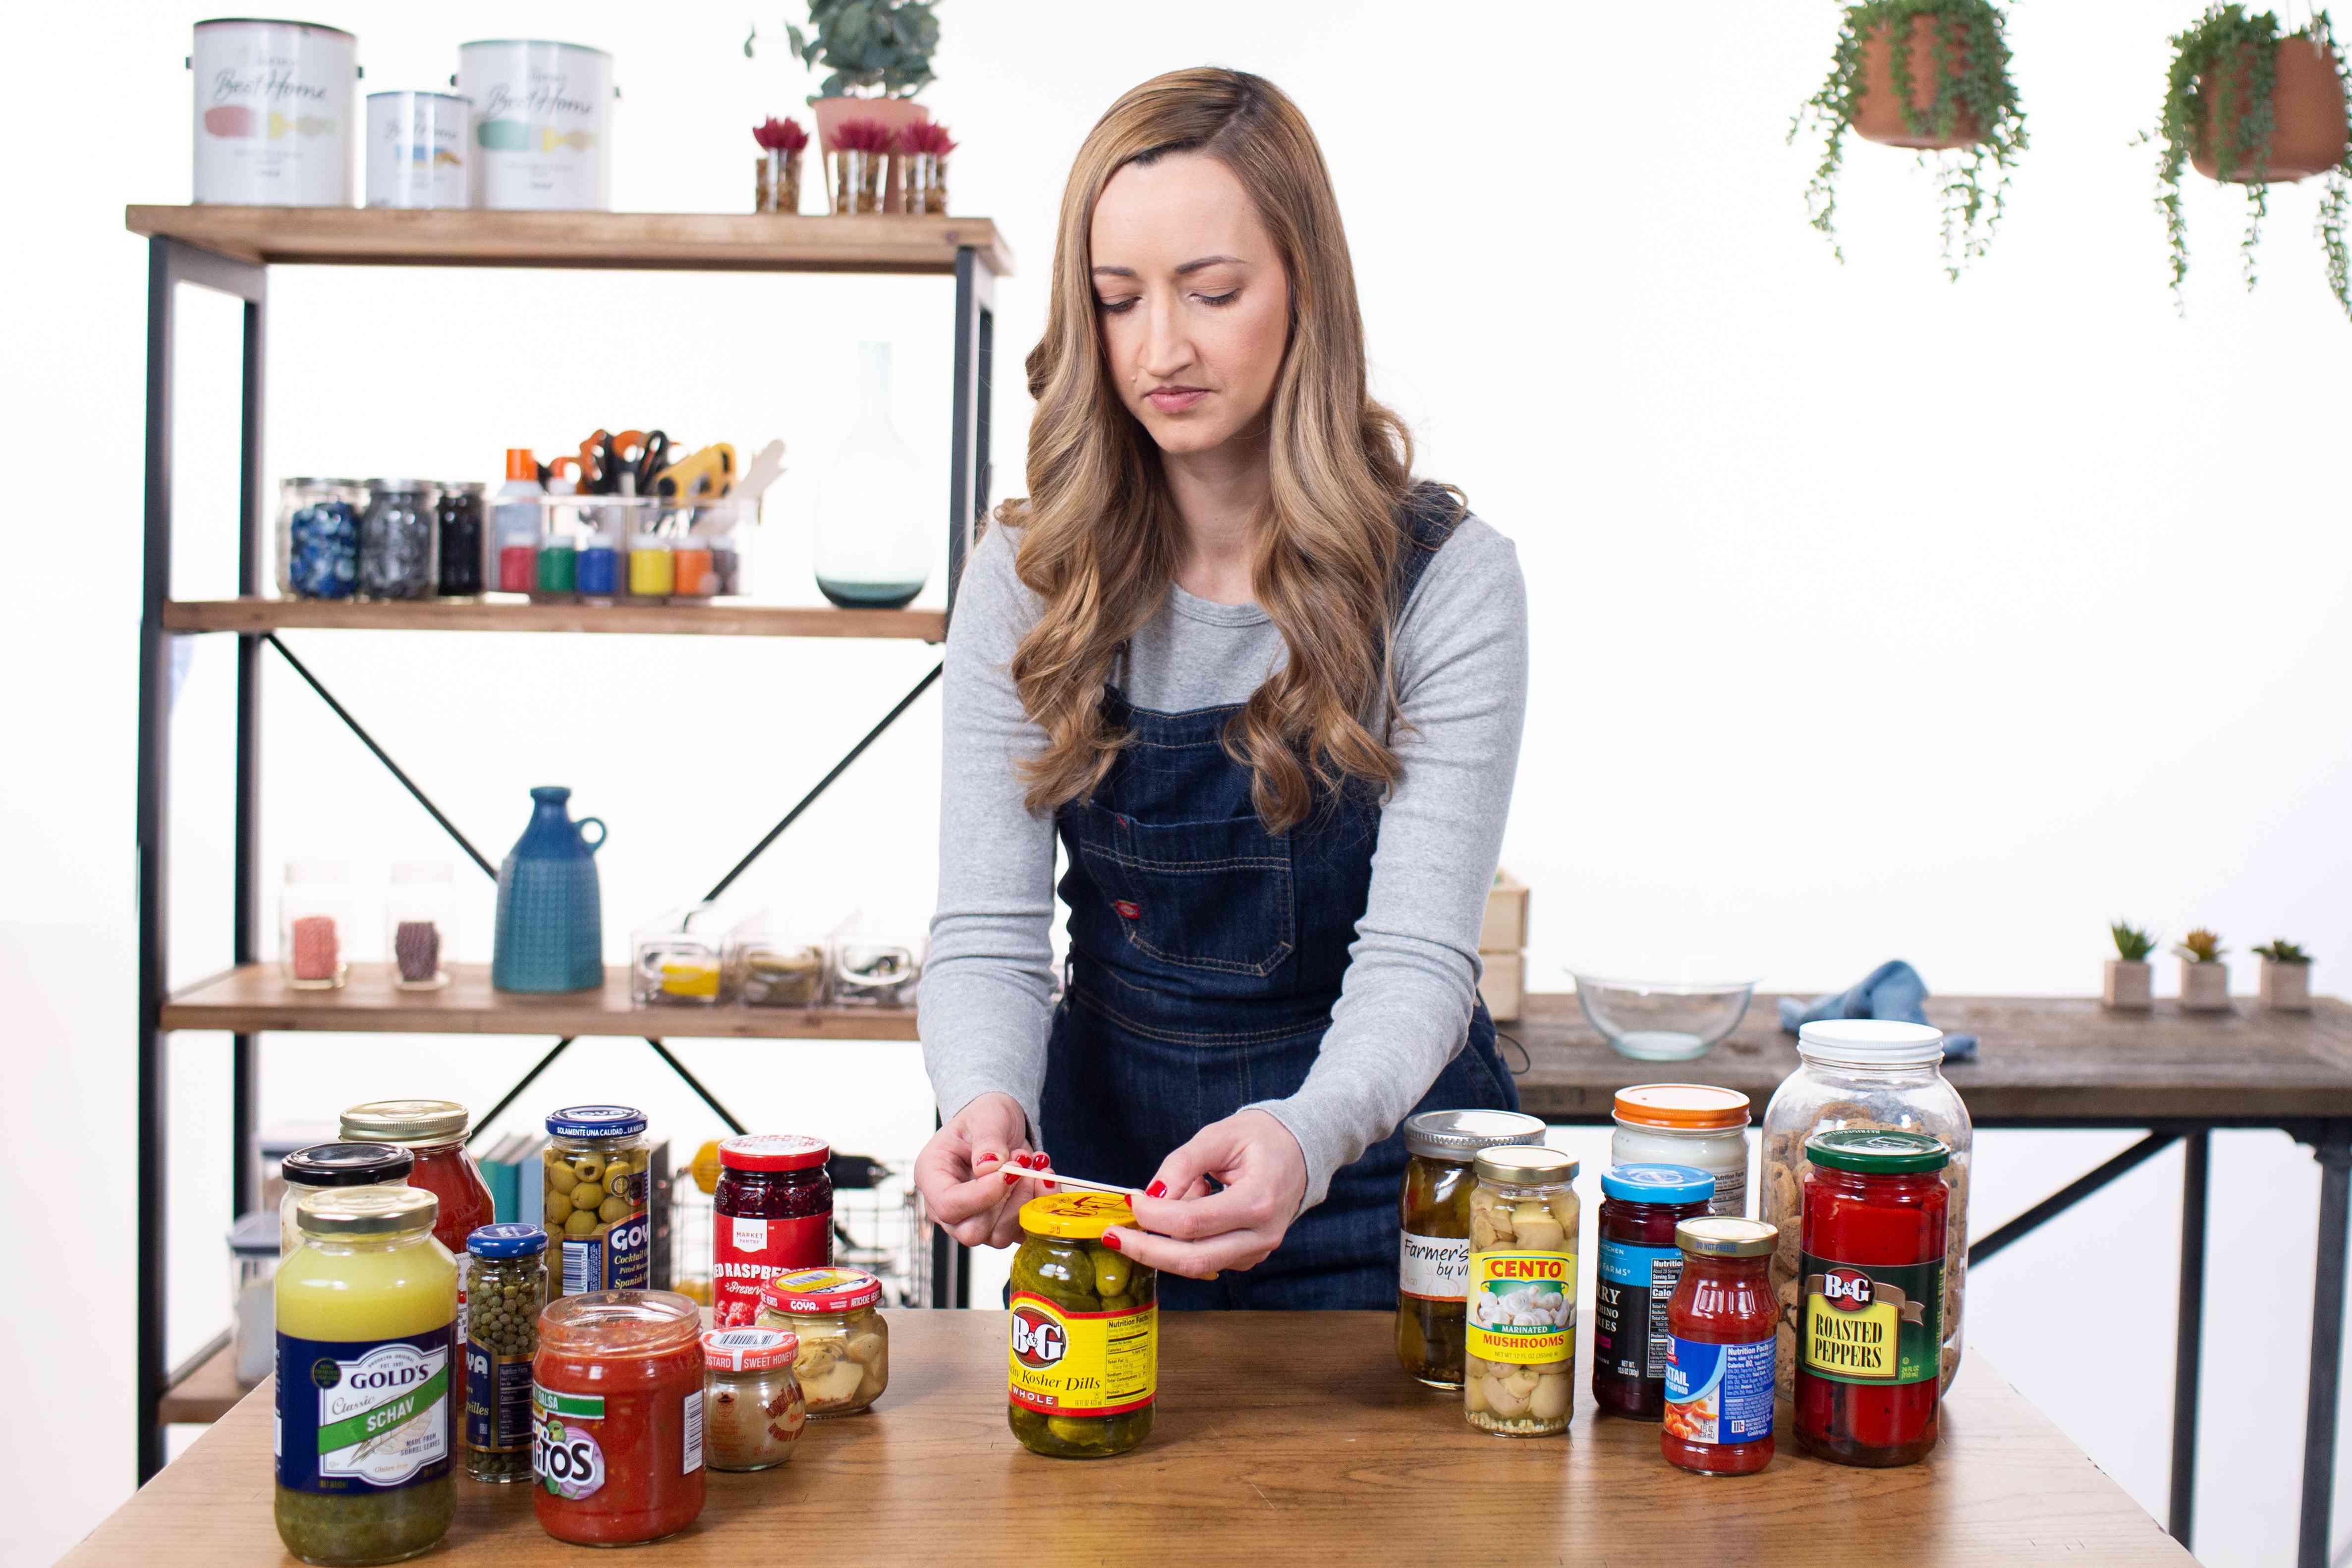 Rubber band jar opening method